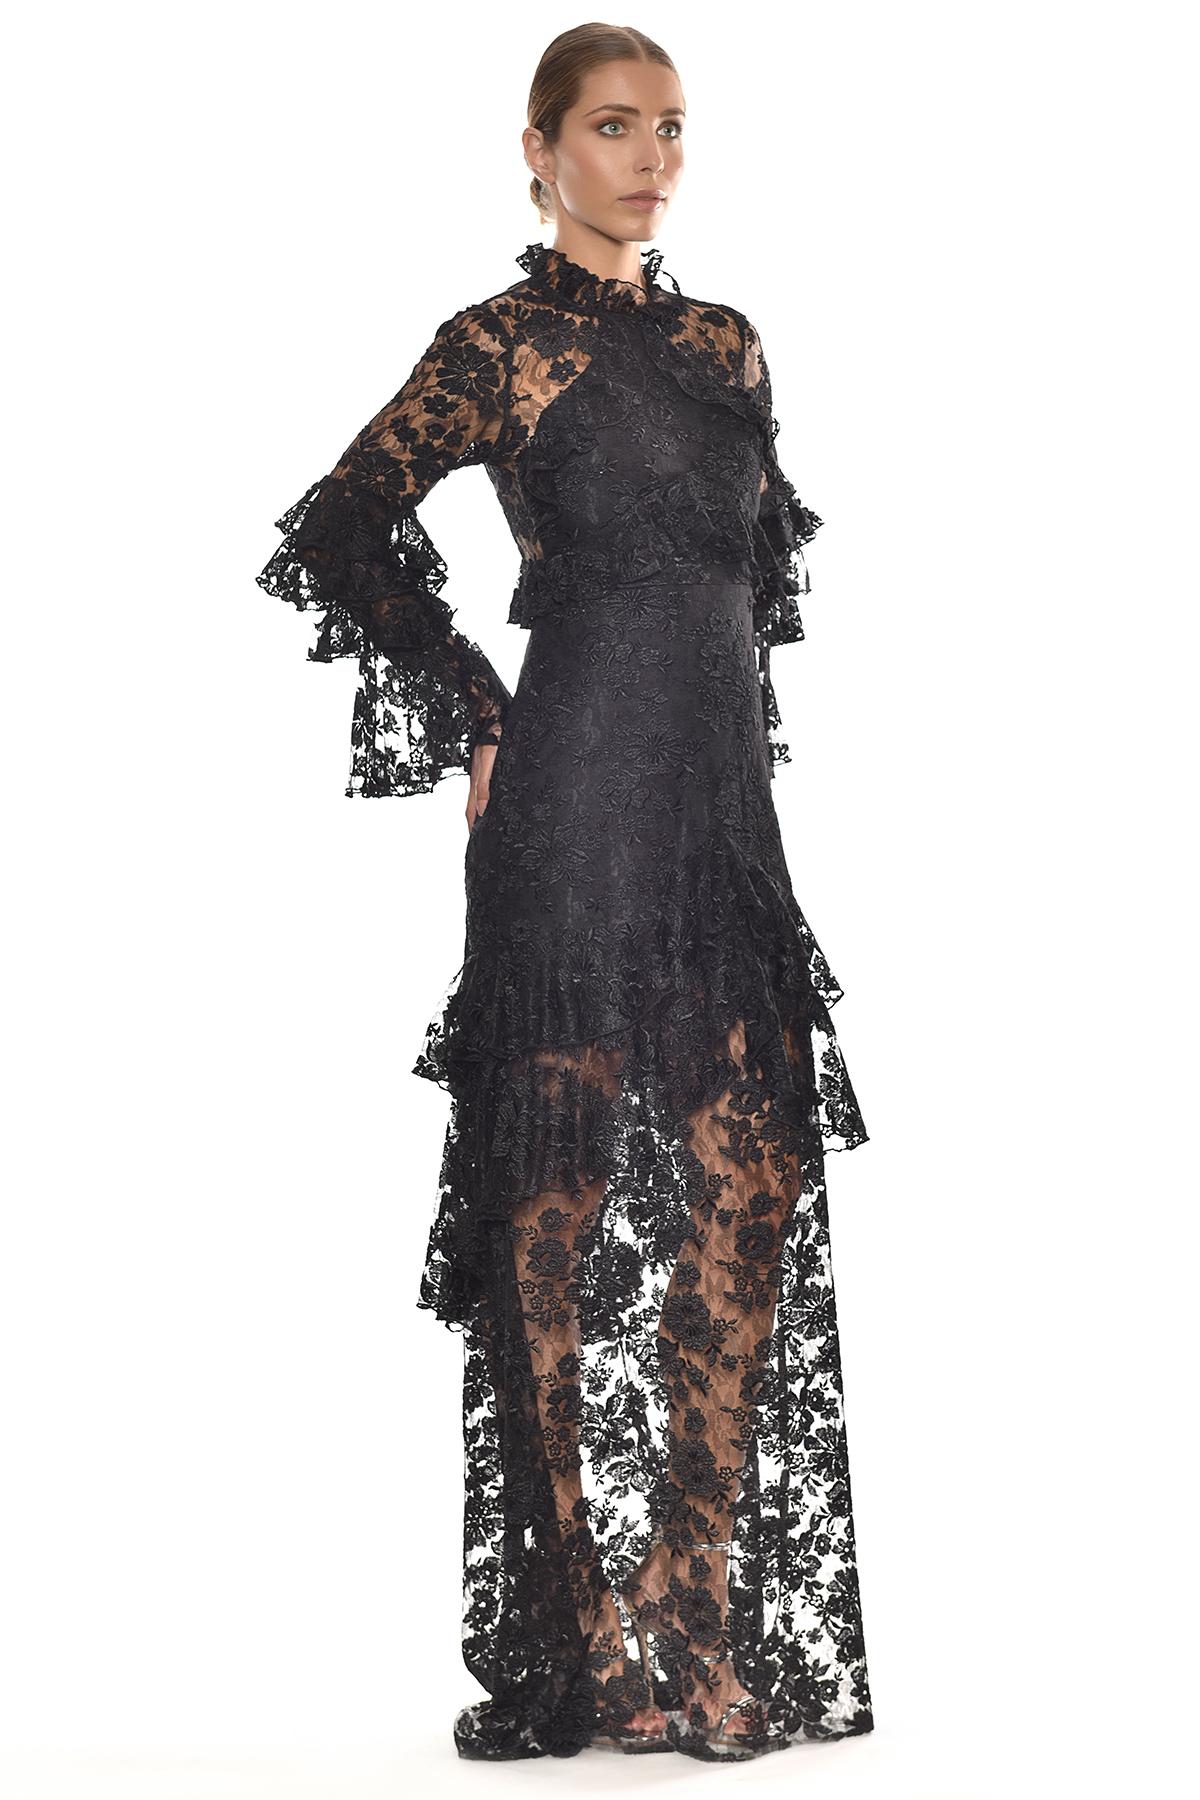 Siyah Dantel İşlemeli Uzun Kollu Dik Yaka Uzun Elbise - Thumbnail